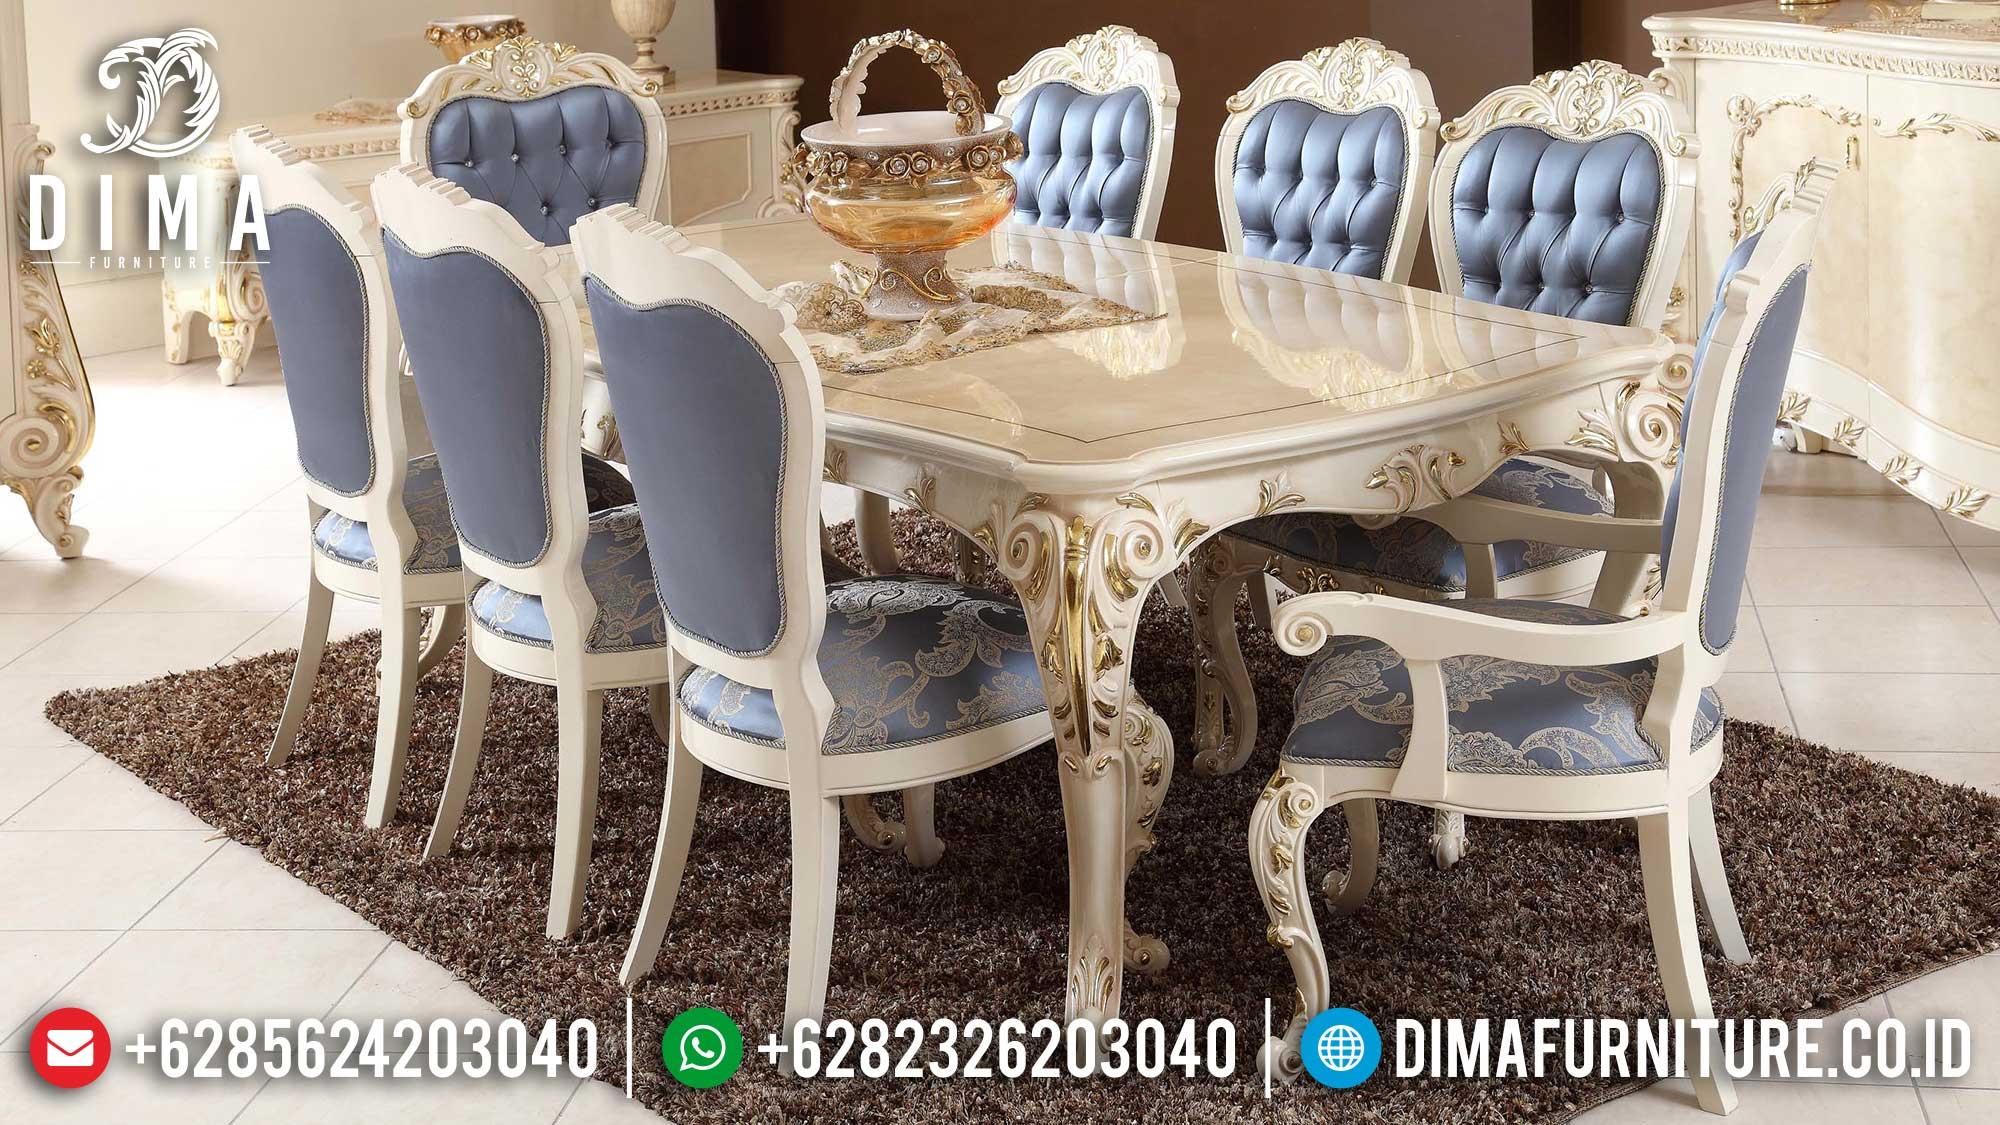 Meja Makan Mewah Jepara Art White Duco Classic Luxurious Furniture Jepara ST-1256